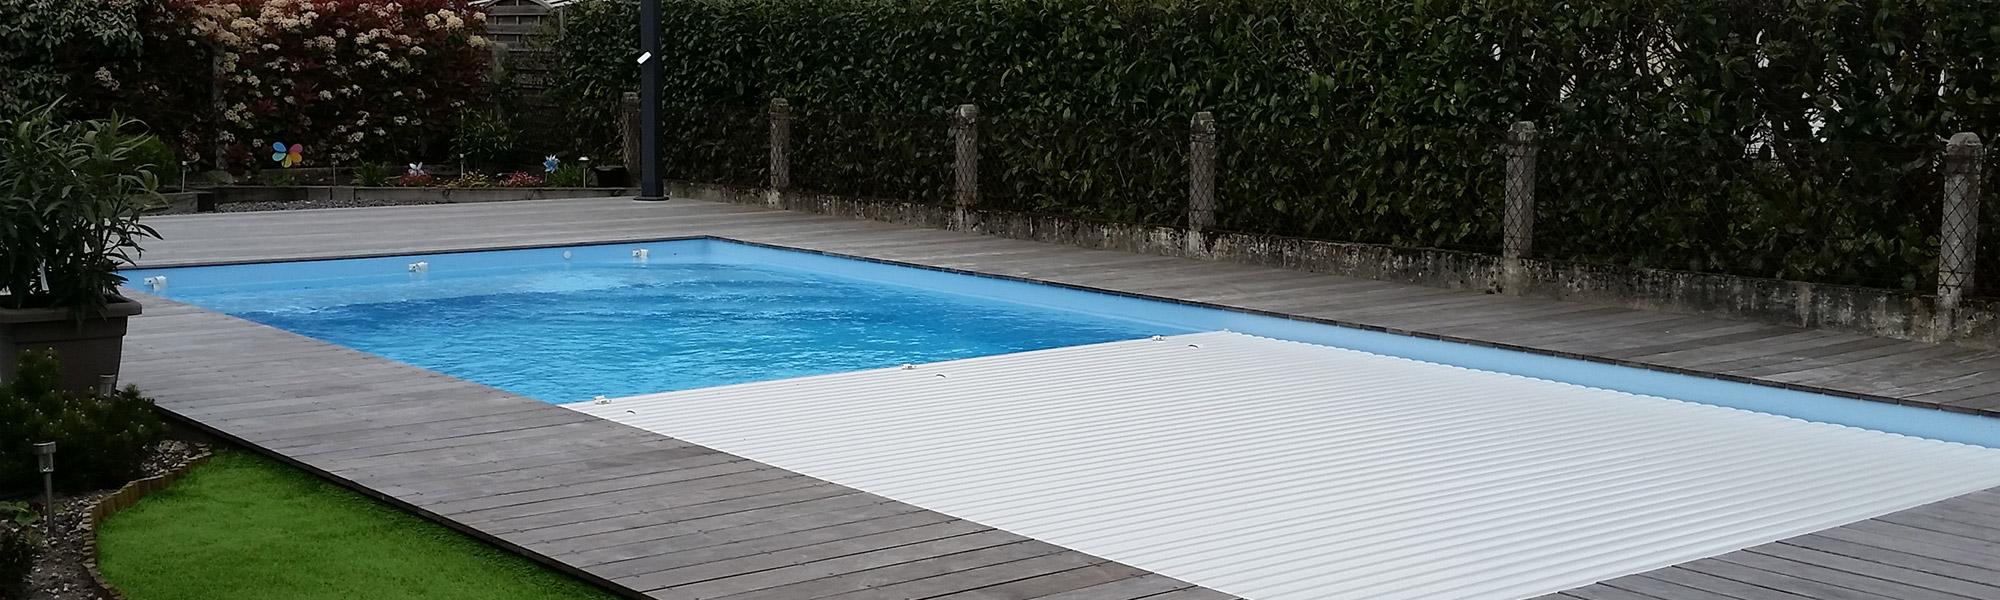 Demander un devis piscine coque bordeaux for Constructeur piscine coque